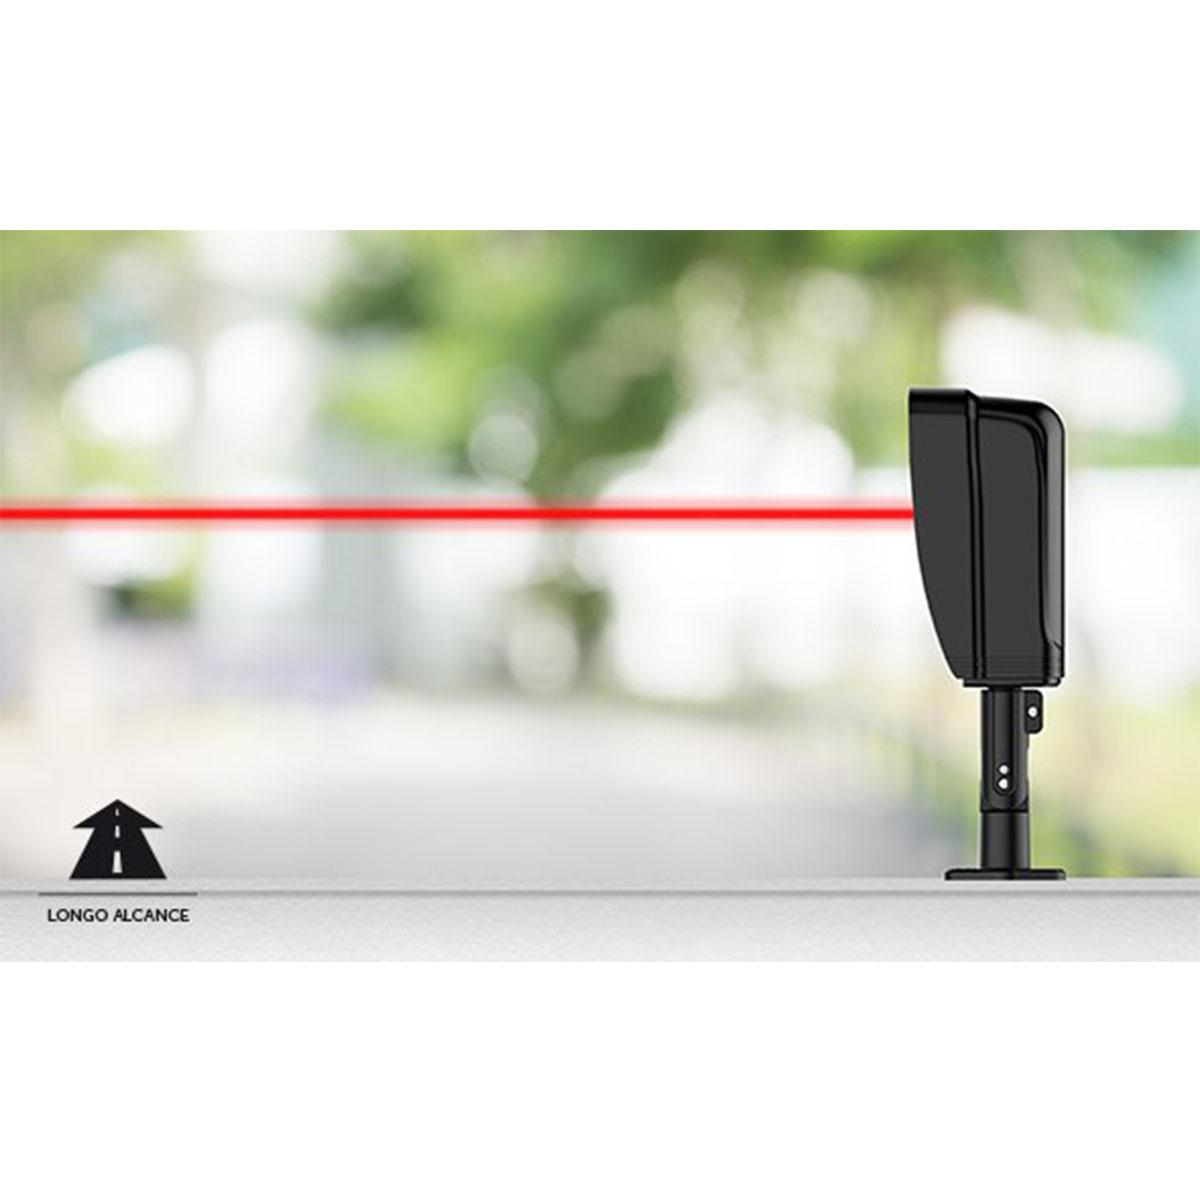 Kit 07 Sensor De Barreira Intelbras Duplo Feixe Iva 5080 At